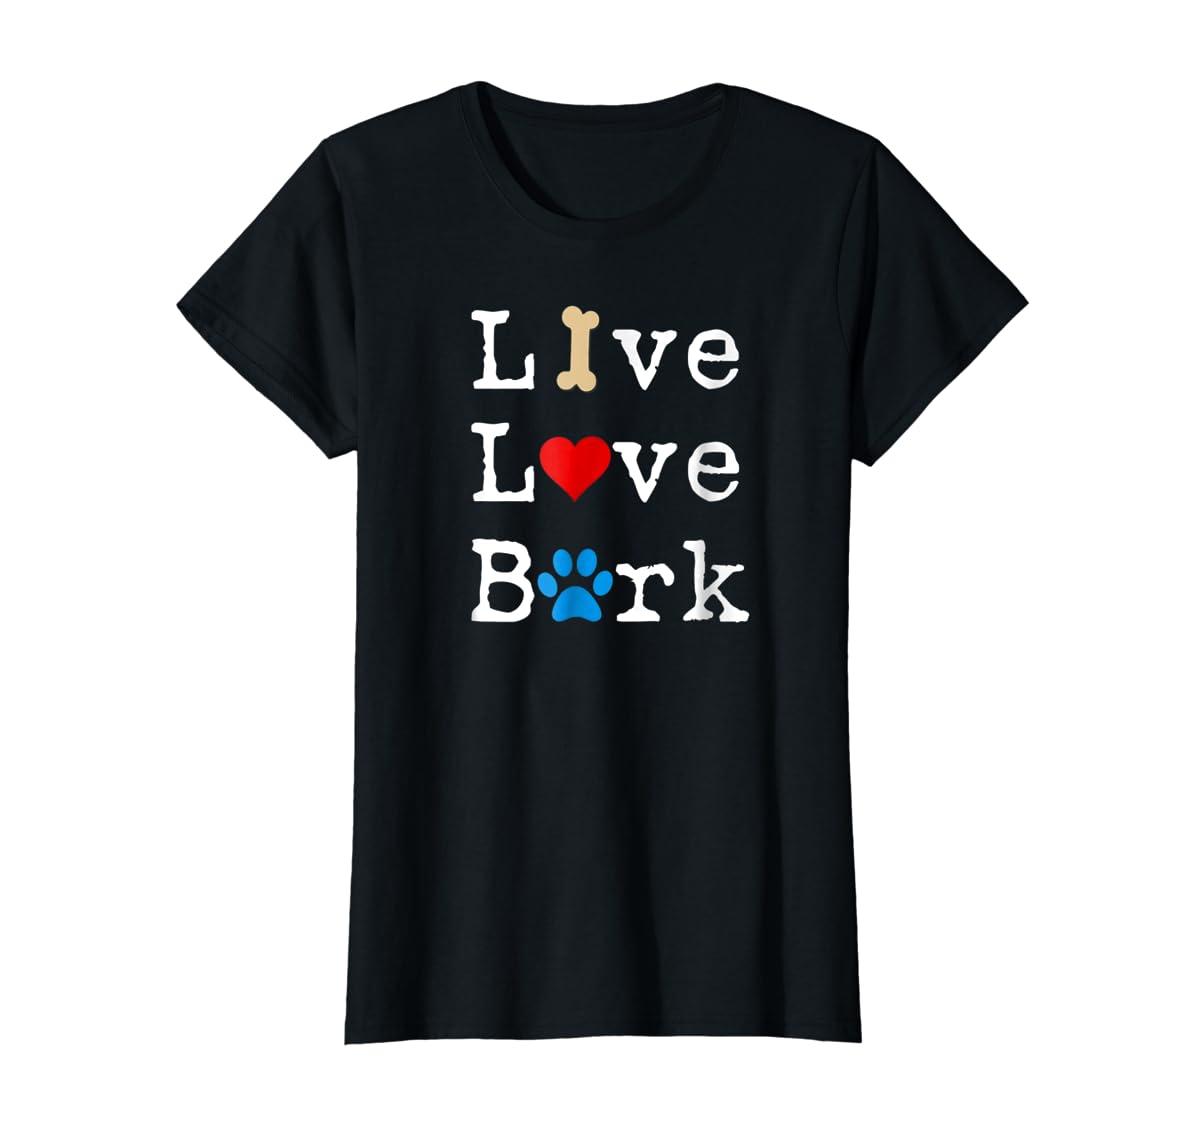 Live Love Bark T-Shirt-Women's T-Shirt-Black